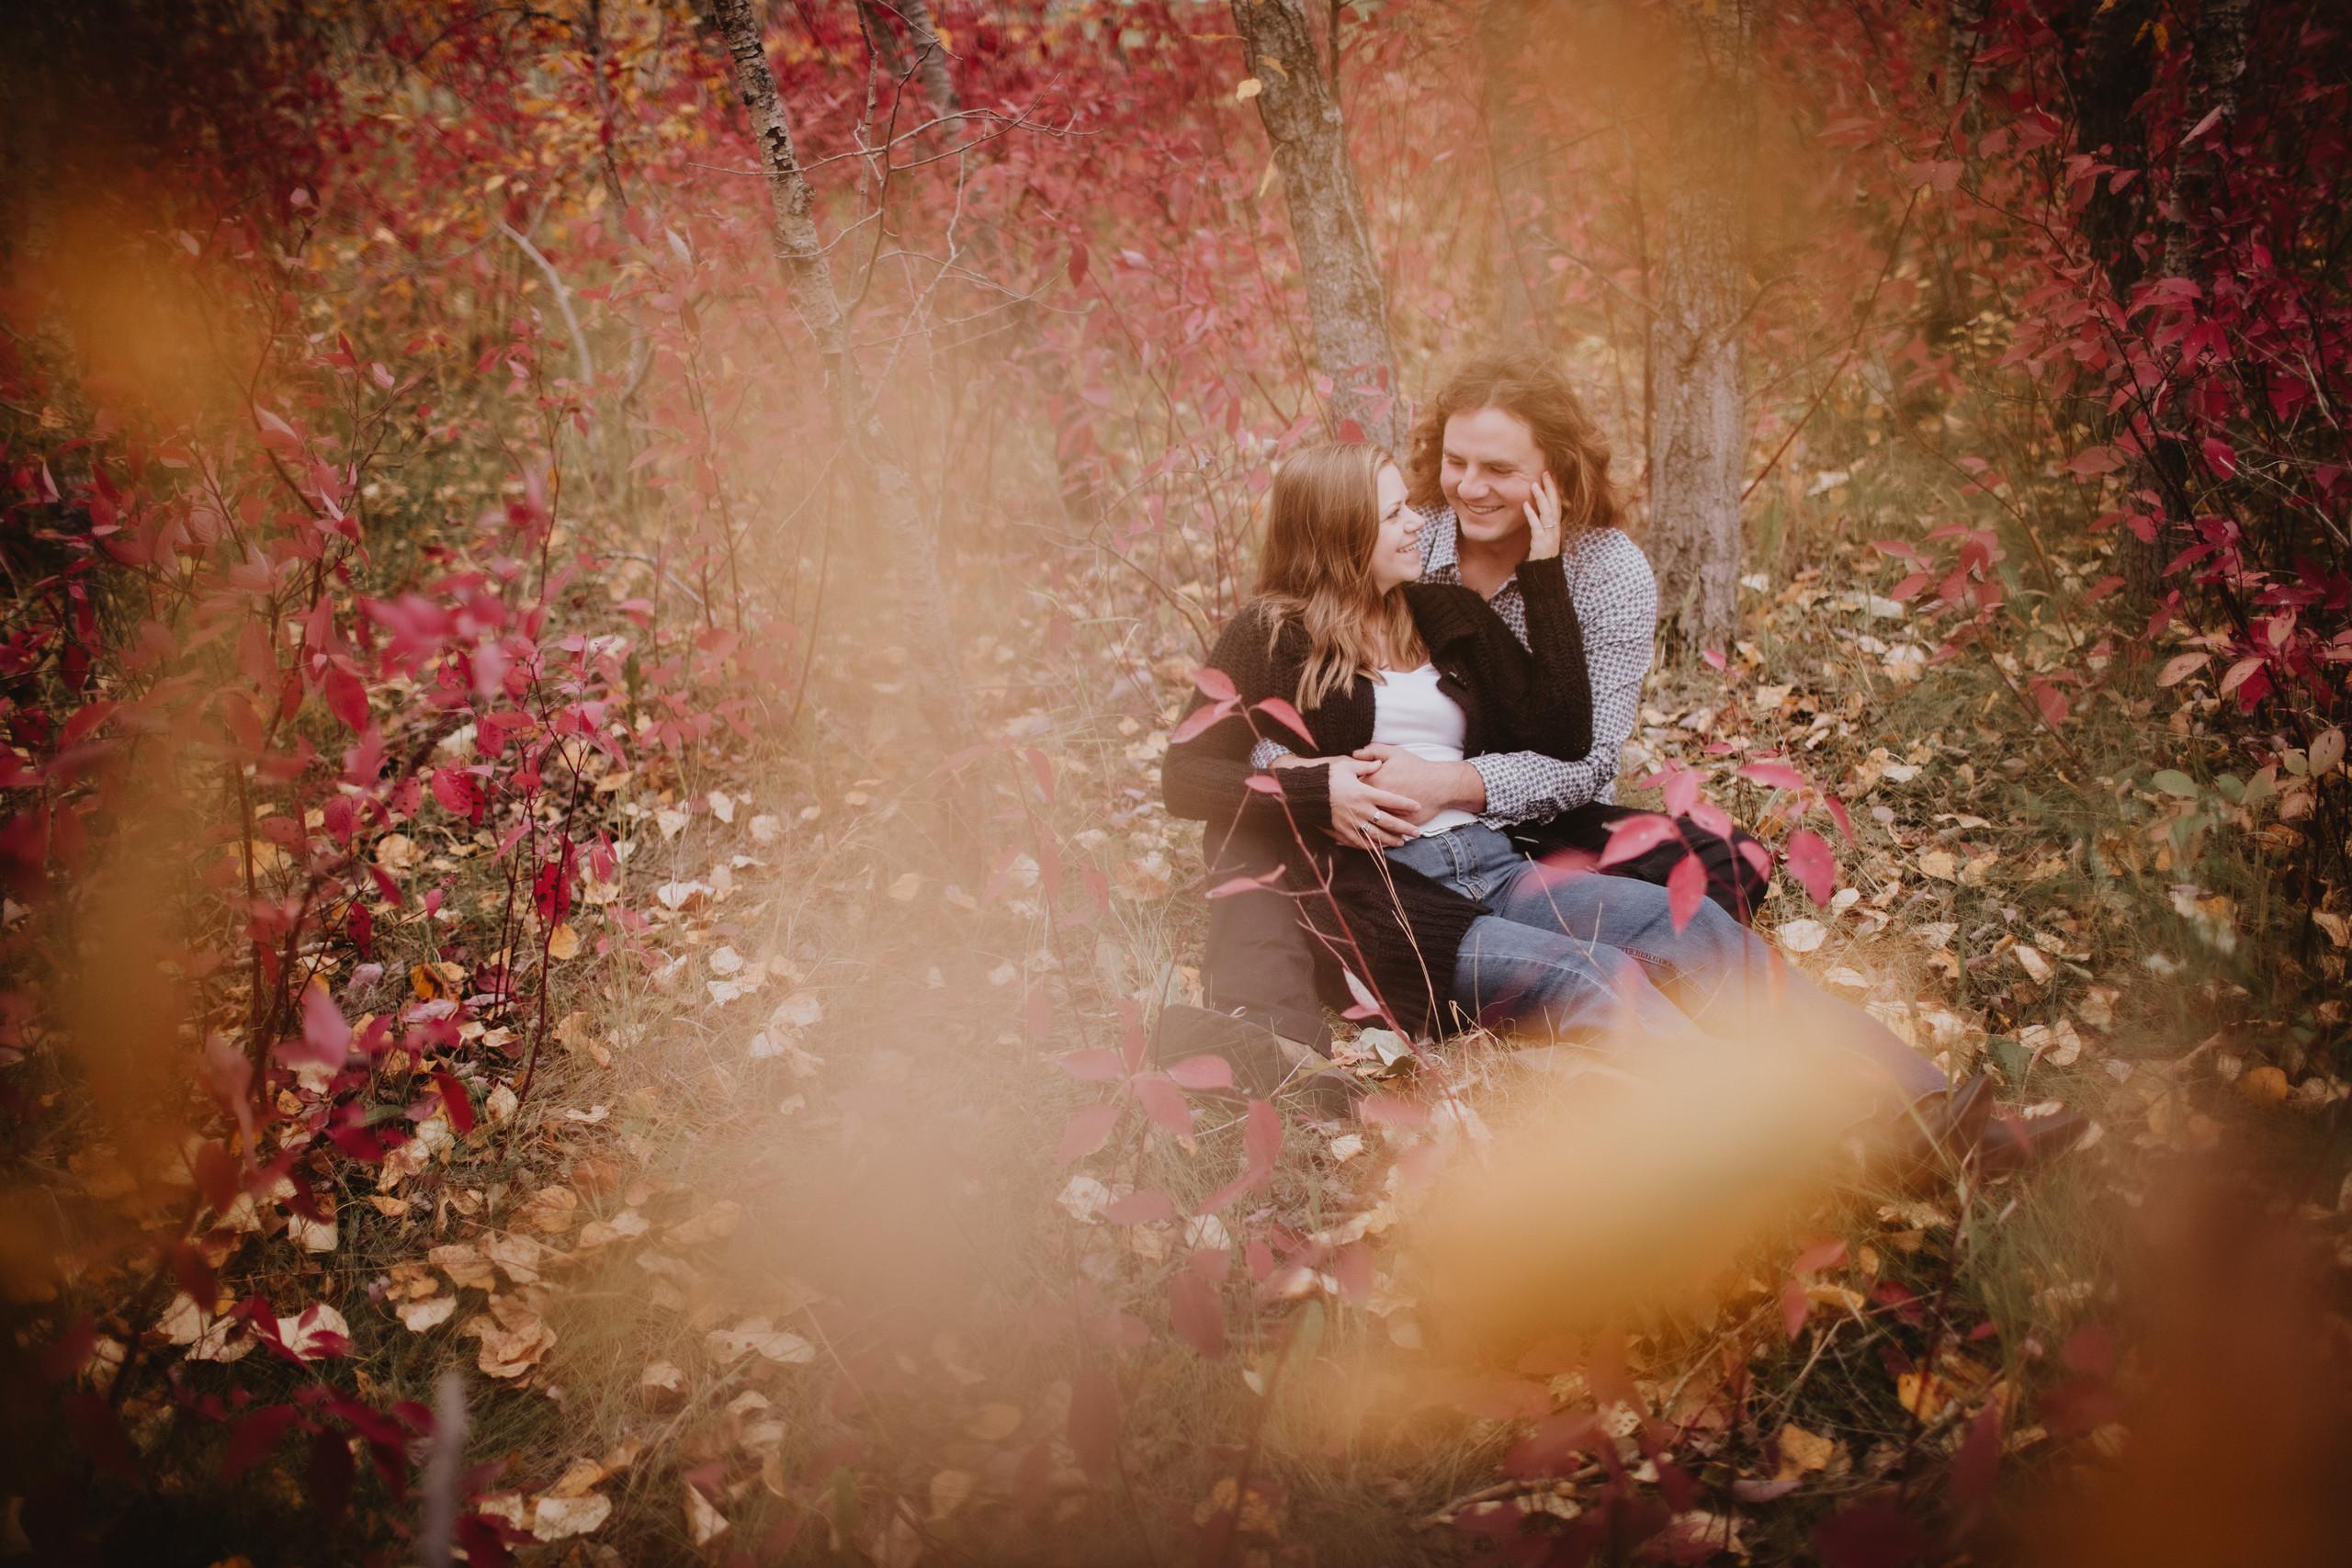 Beautiful Fall Foliage during engagement photoshoot.